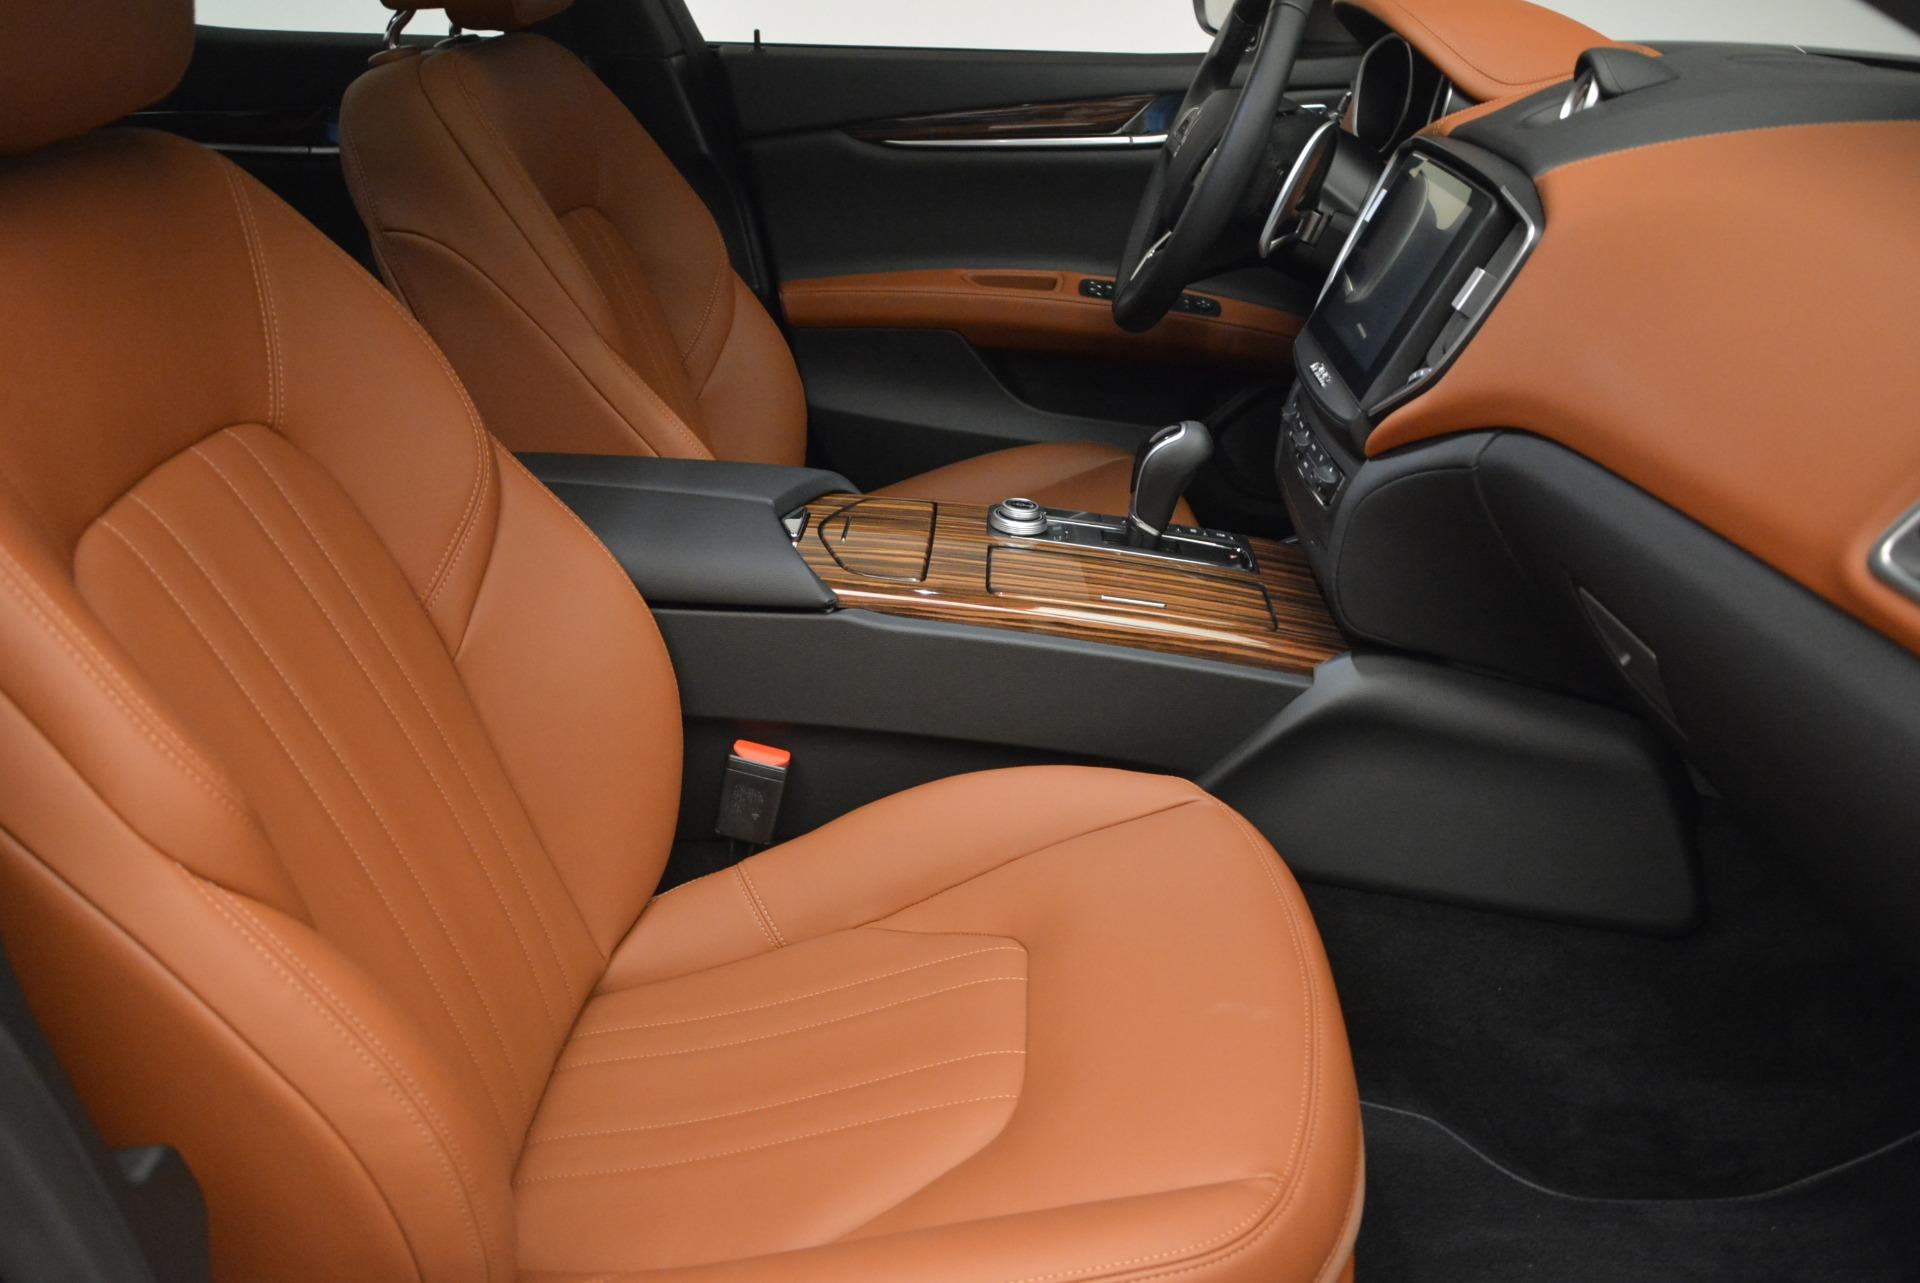 Used 2017 Maserati Ghibli S Q4 EX-LOANER For Sale In Westport, CT 608_p21